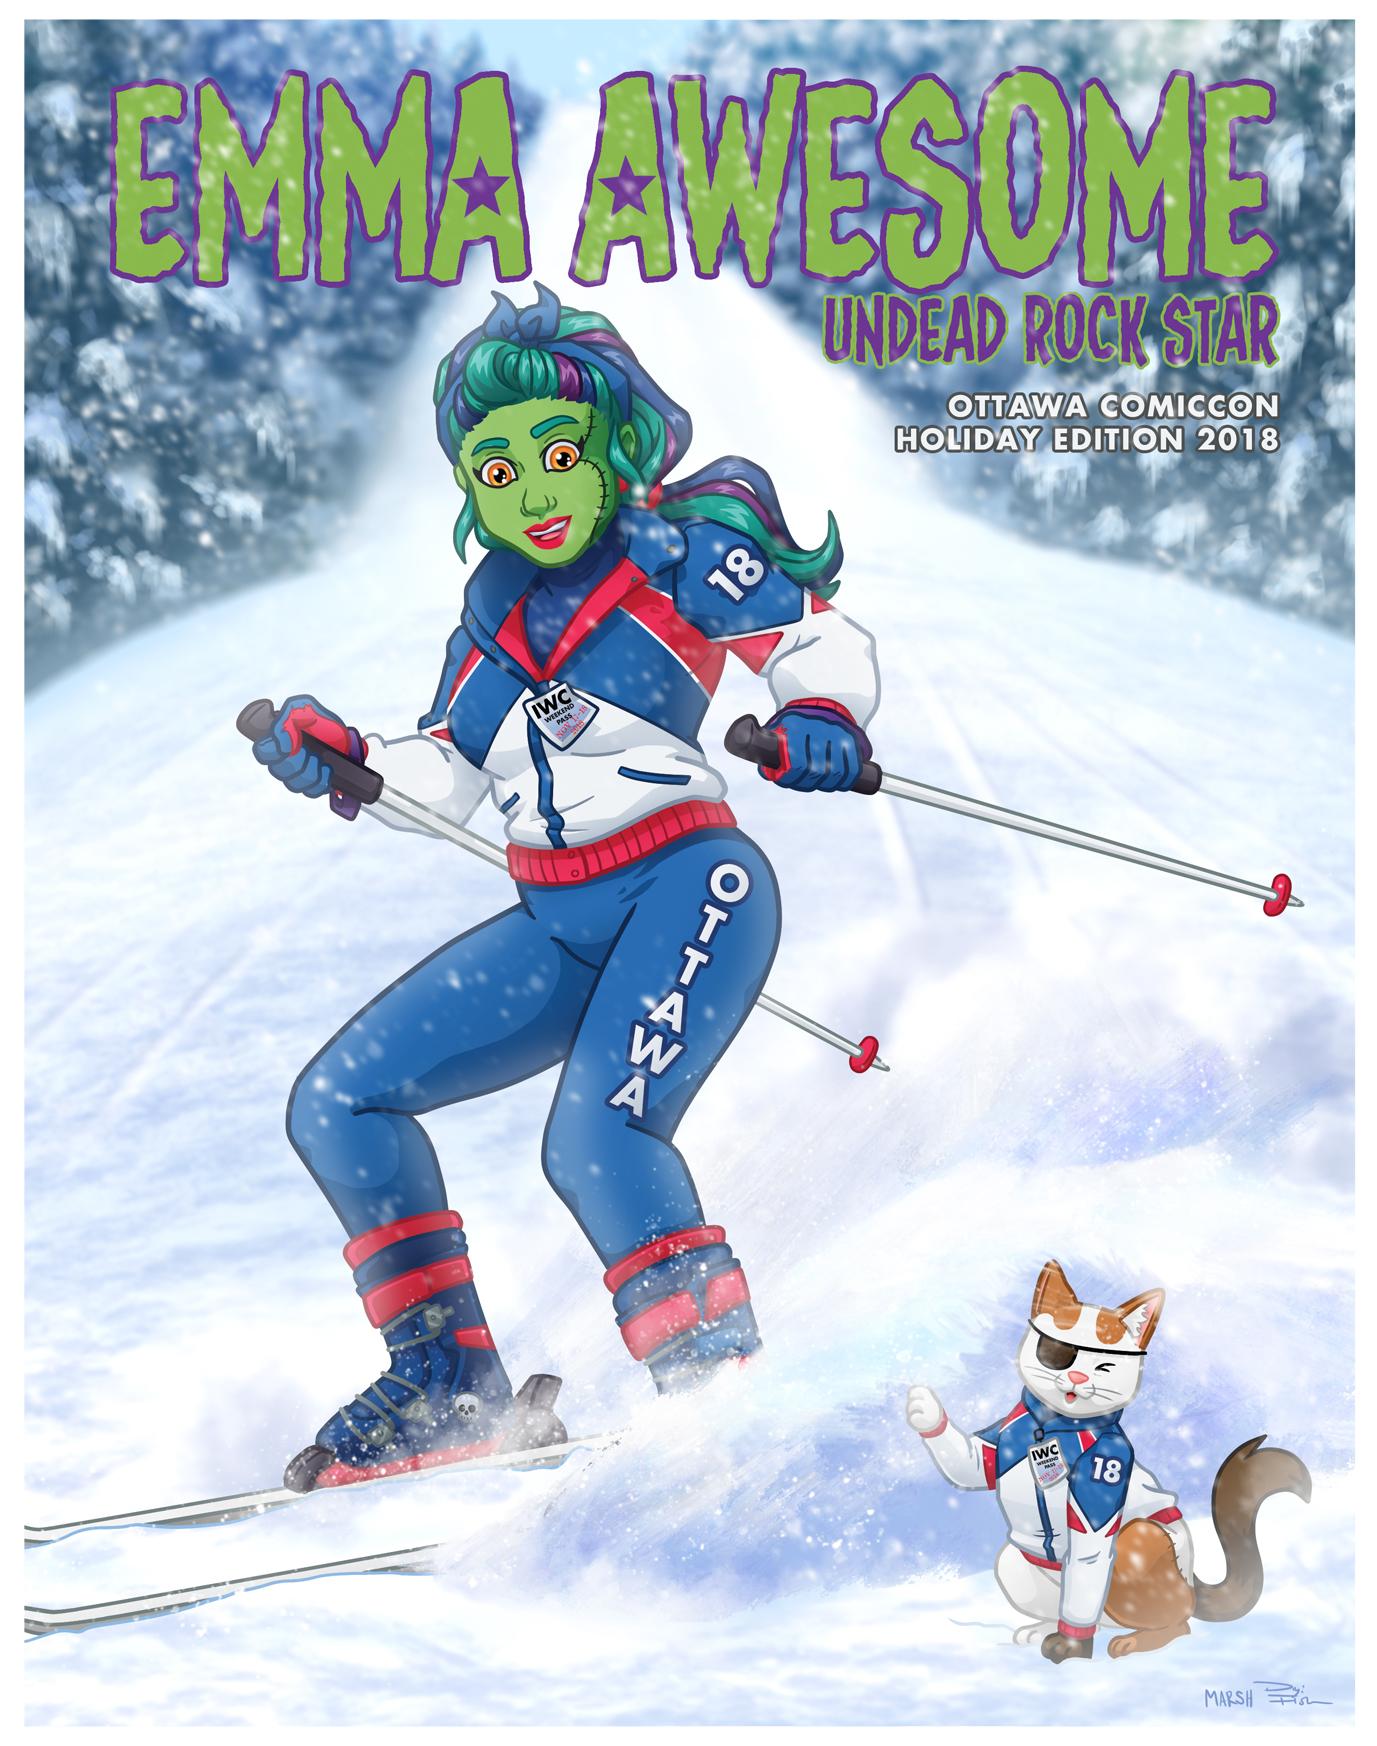 Emma Awesome - Ottawa Comiccon: Holiday Edition